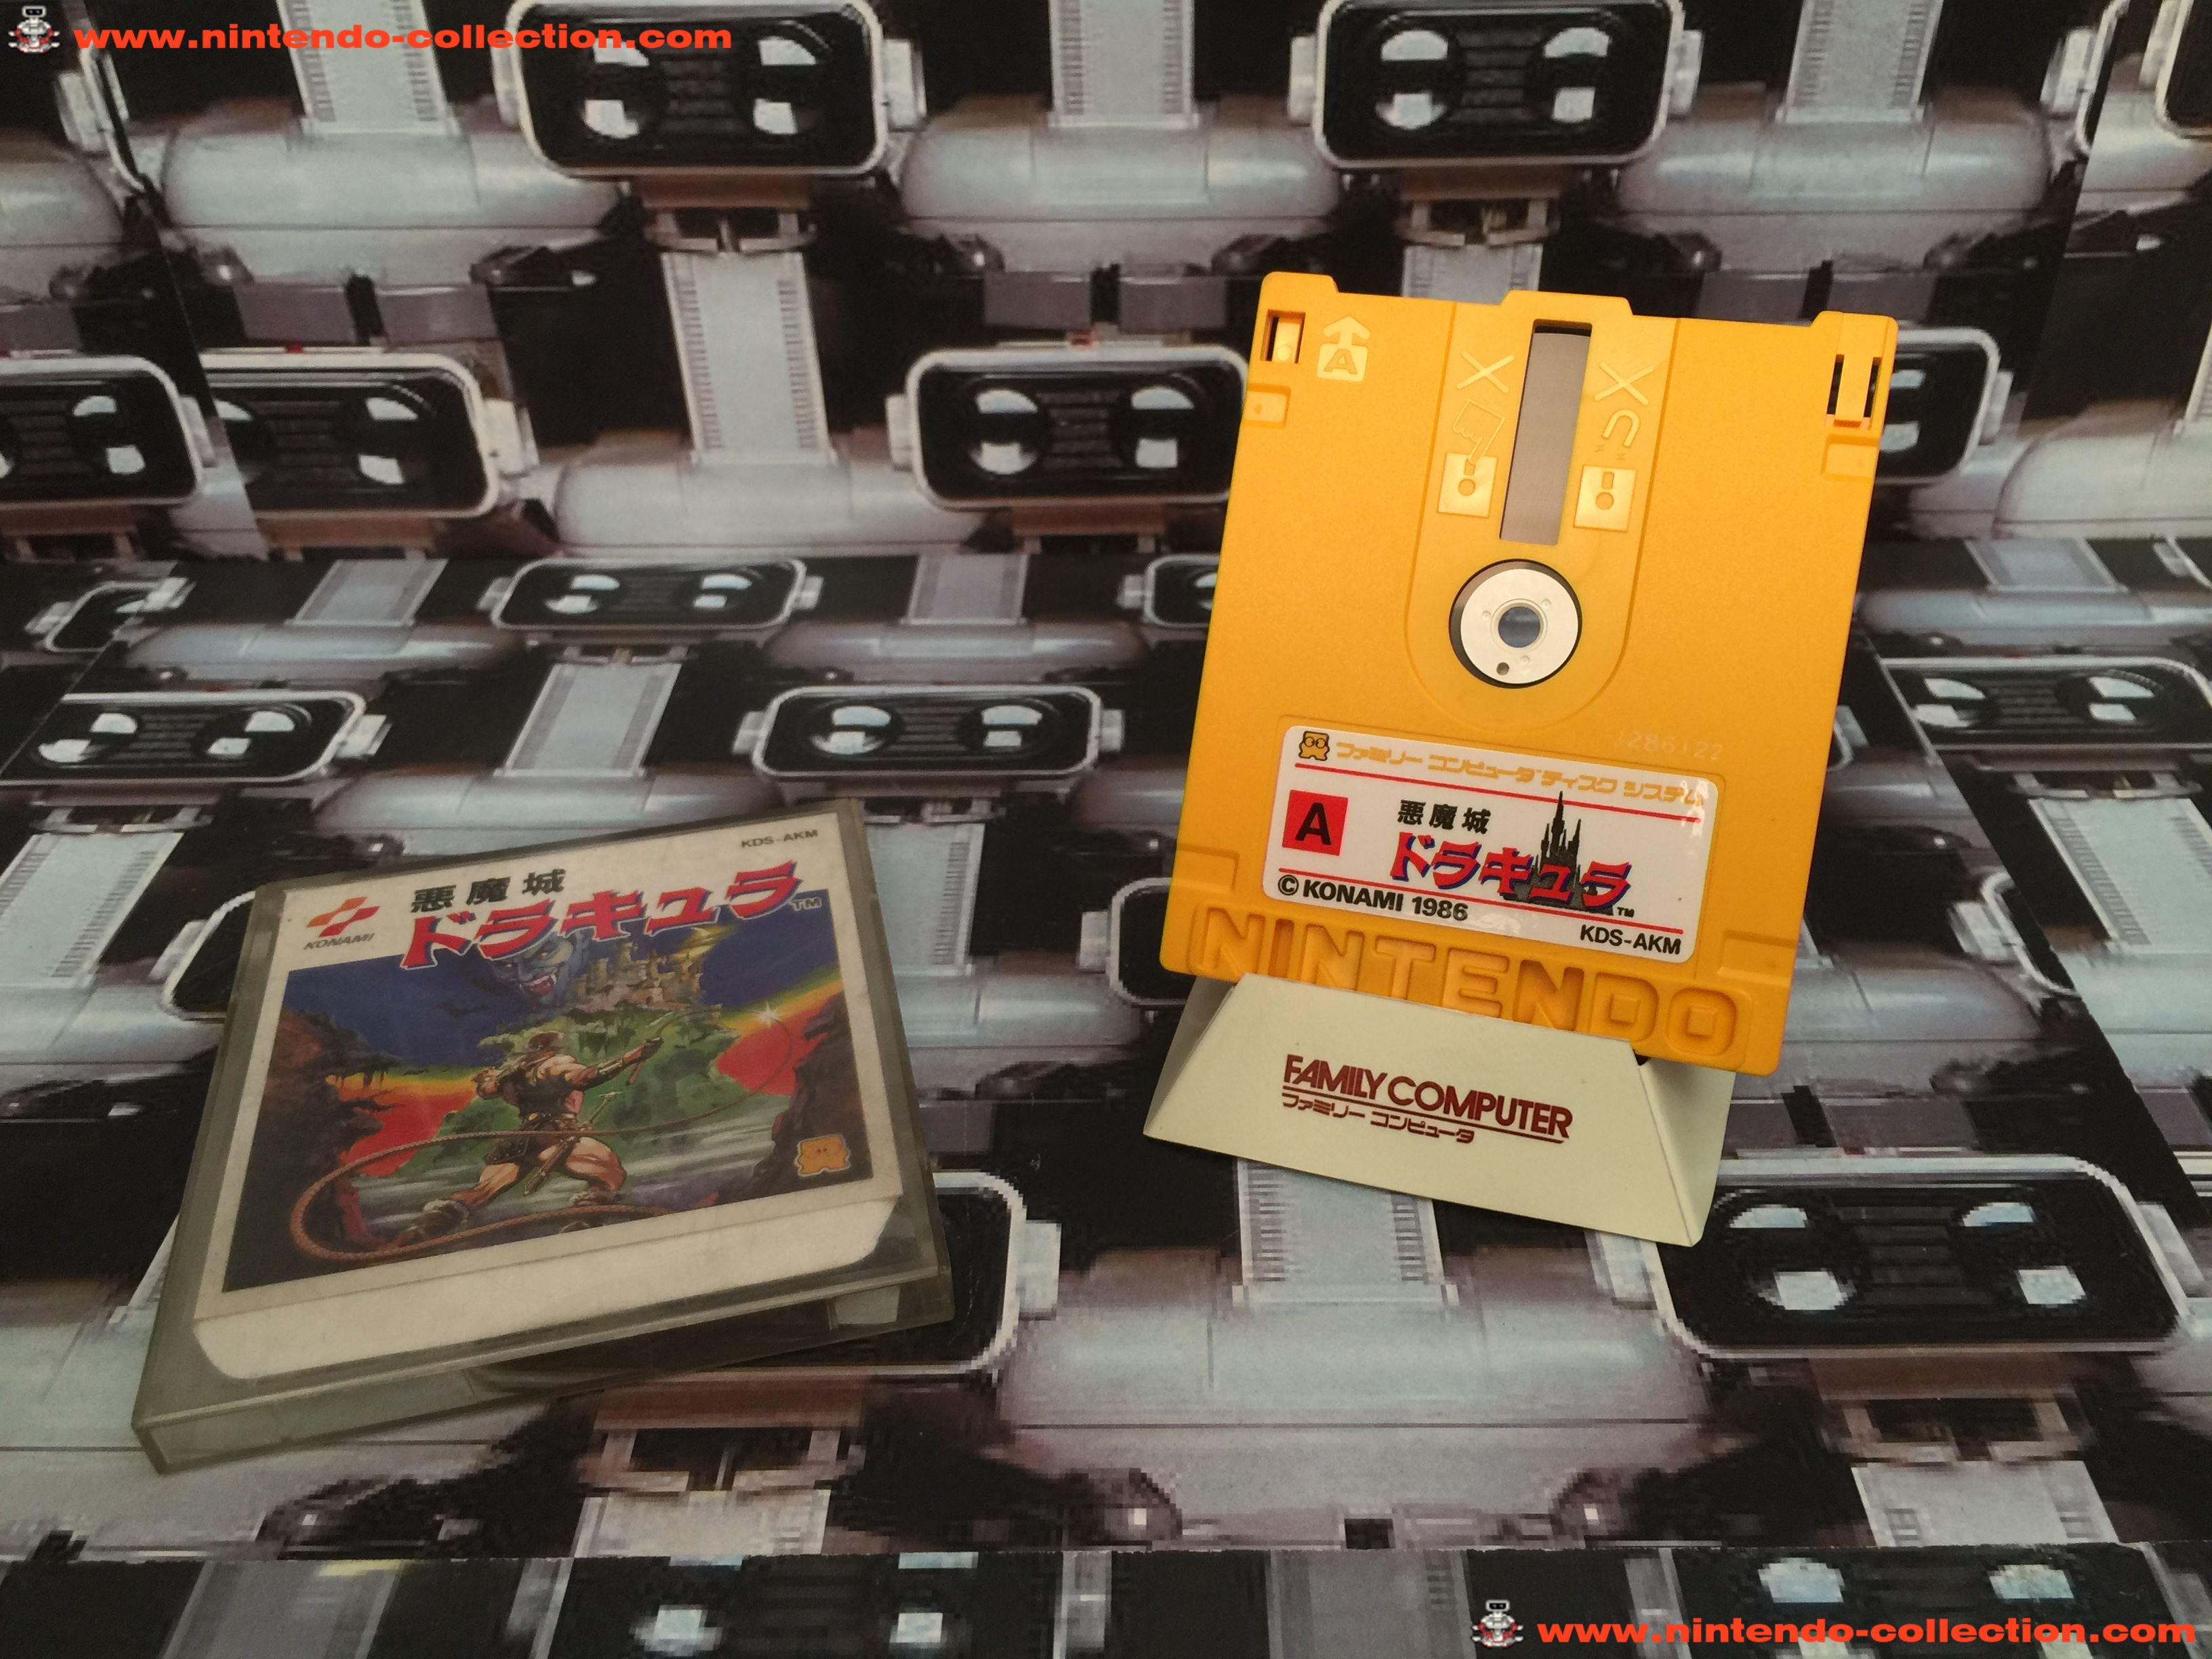 www.nintendo-collection.com_-_Family_Computer_Famicom_Disk_System_Jeux_Game_Akumajō_Dracula_Castelva